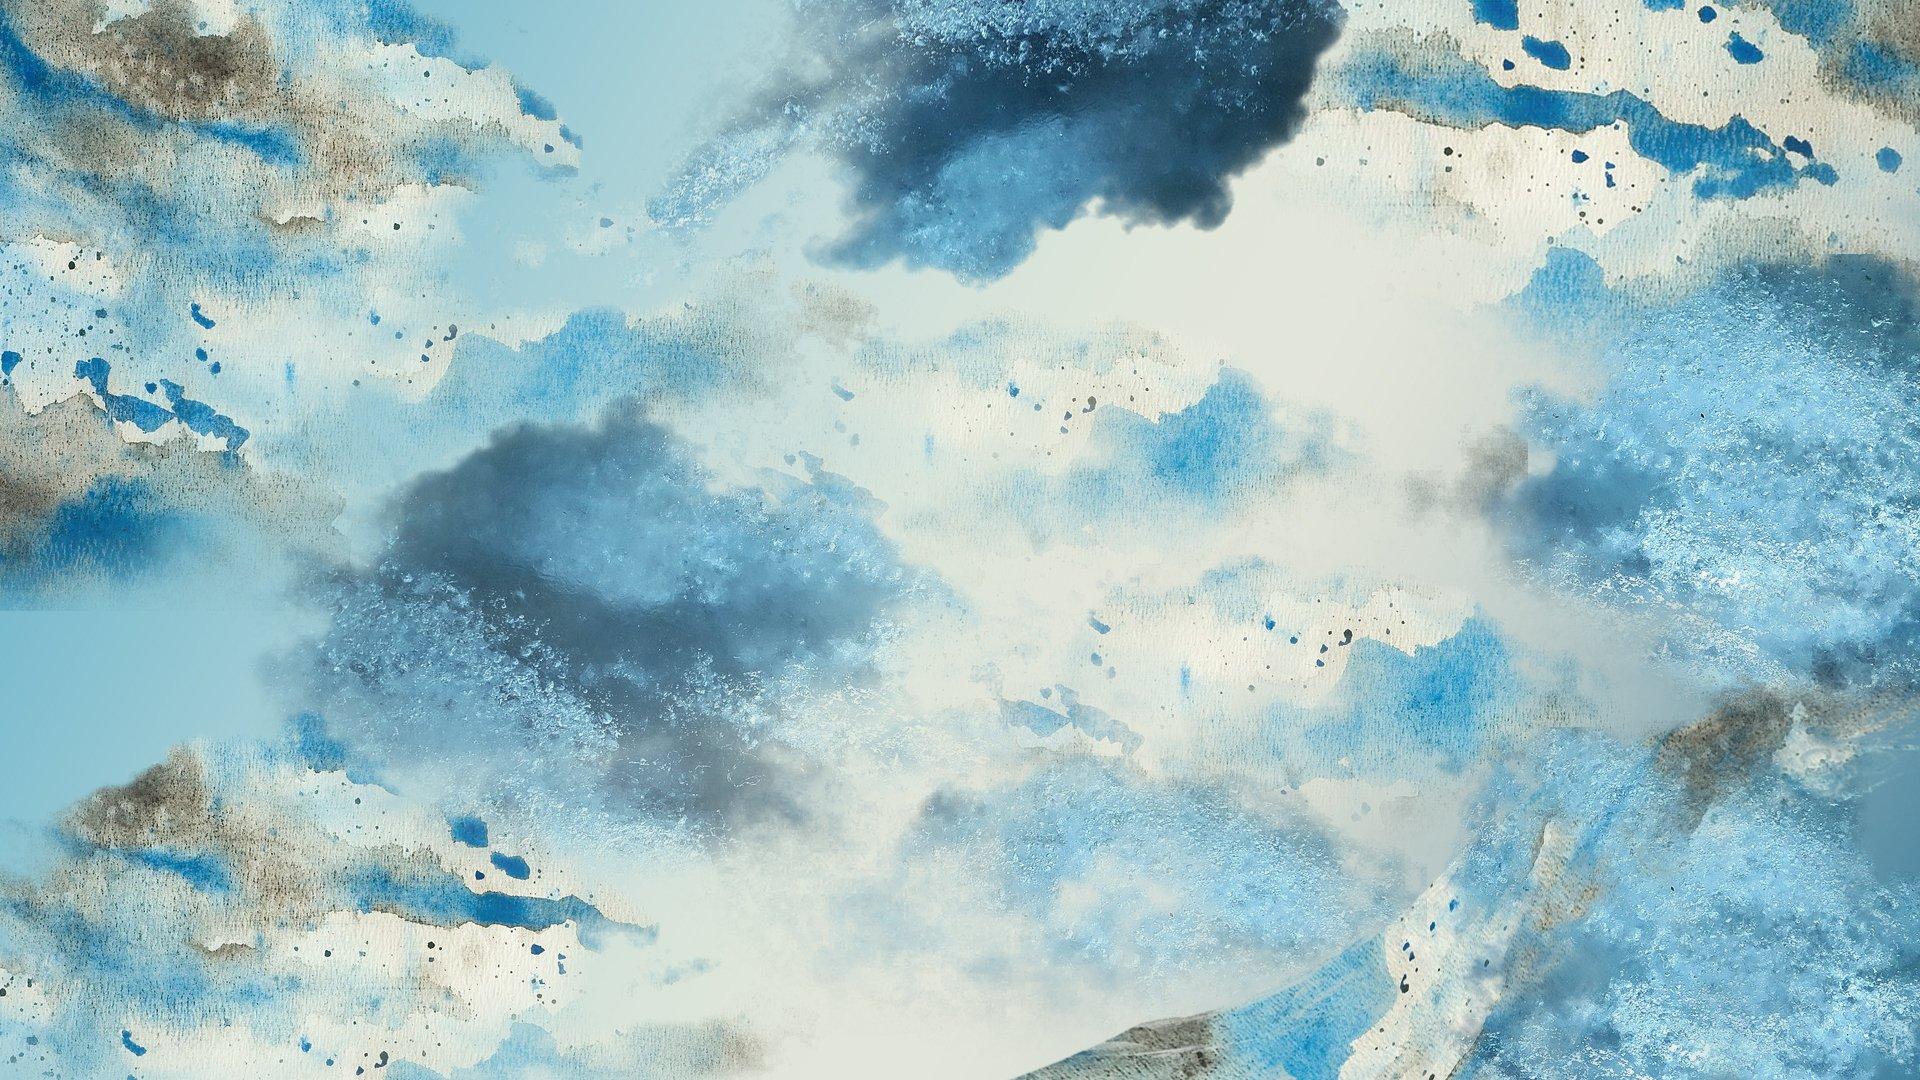 Blue Watercolors Hd Wallpaper Background Image 1920x1080